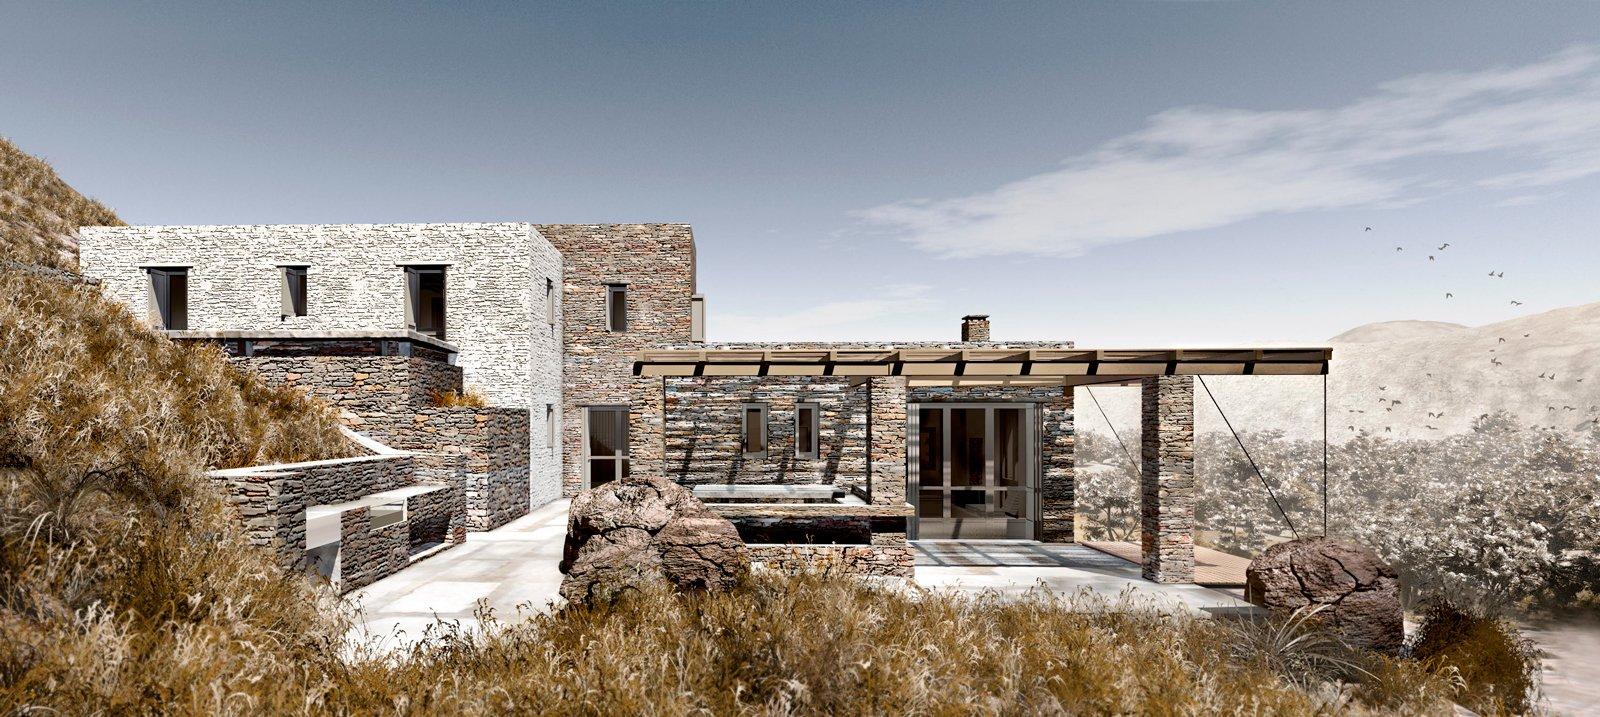 Outdoor, Hardscapes, Grass, Boulders, and Concrete Patio, Porch, Deck 3D Render  ROCKSPLIT house by COMETA ARCHITECTS